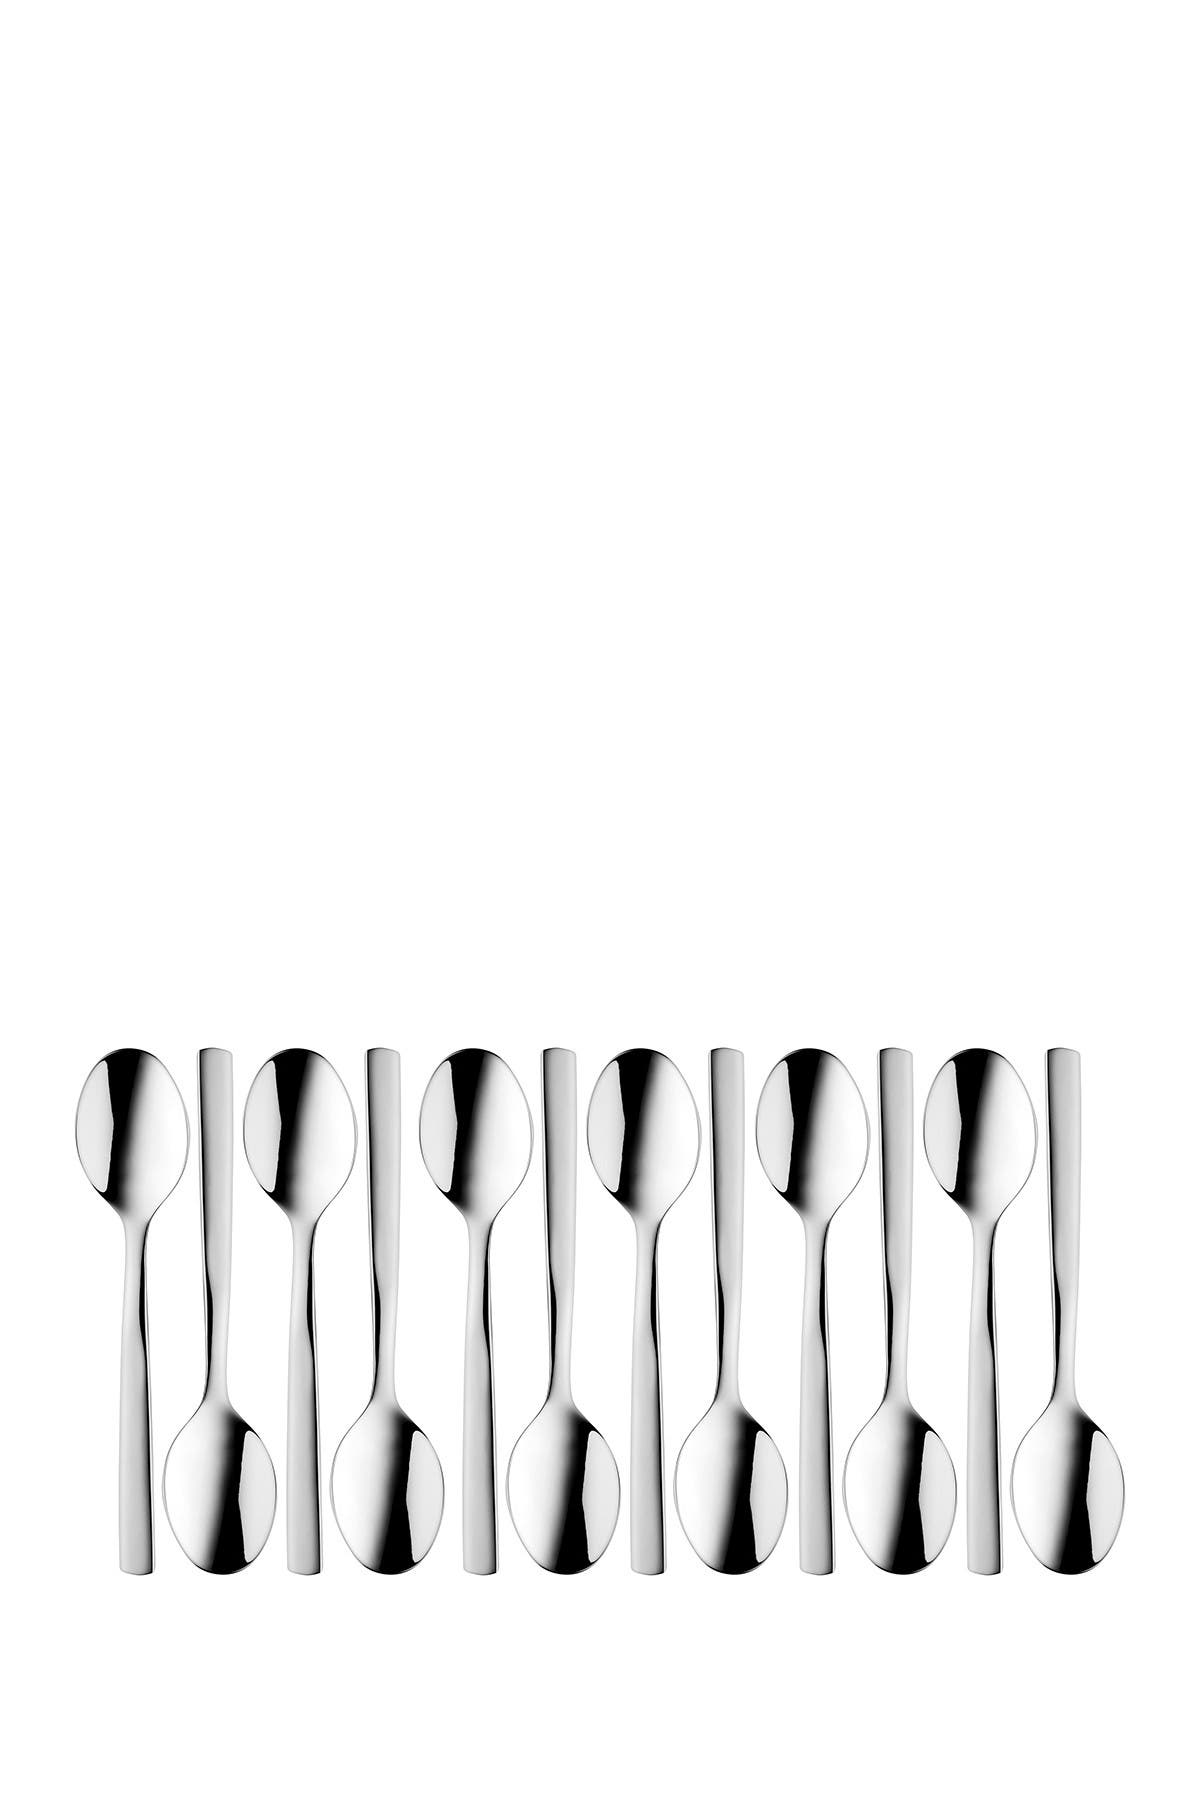 Image of BergHOFF Essentials Coffee Spoon - Set of 12